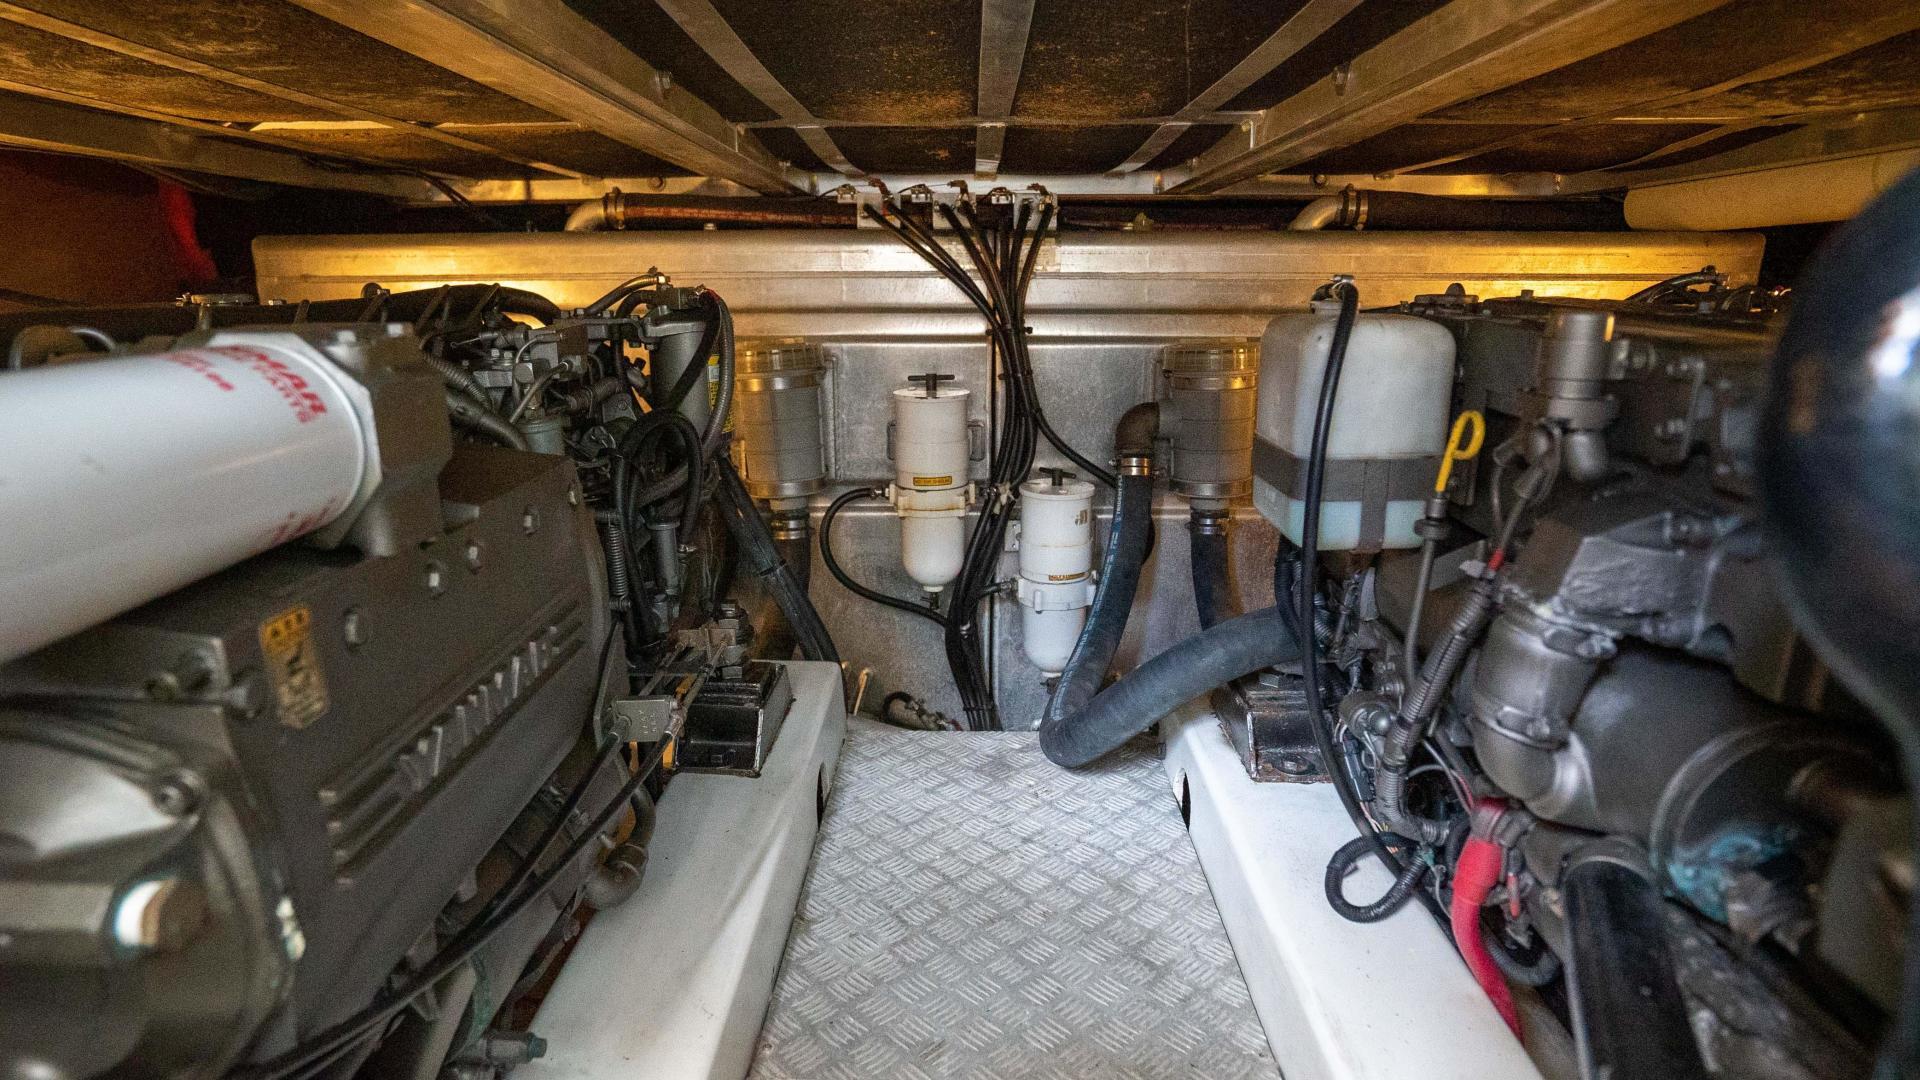 Beneteau-Swift Trawler 2008-Amadeus Acapulco-Mexico-1487094 | Thumbnail